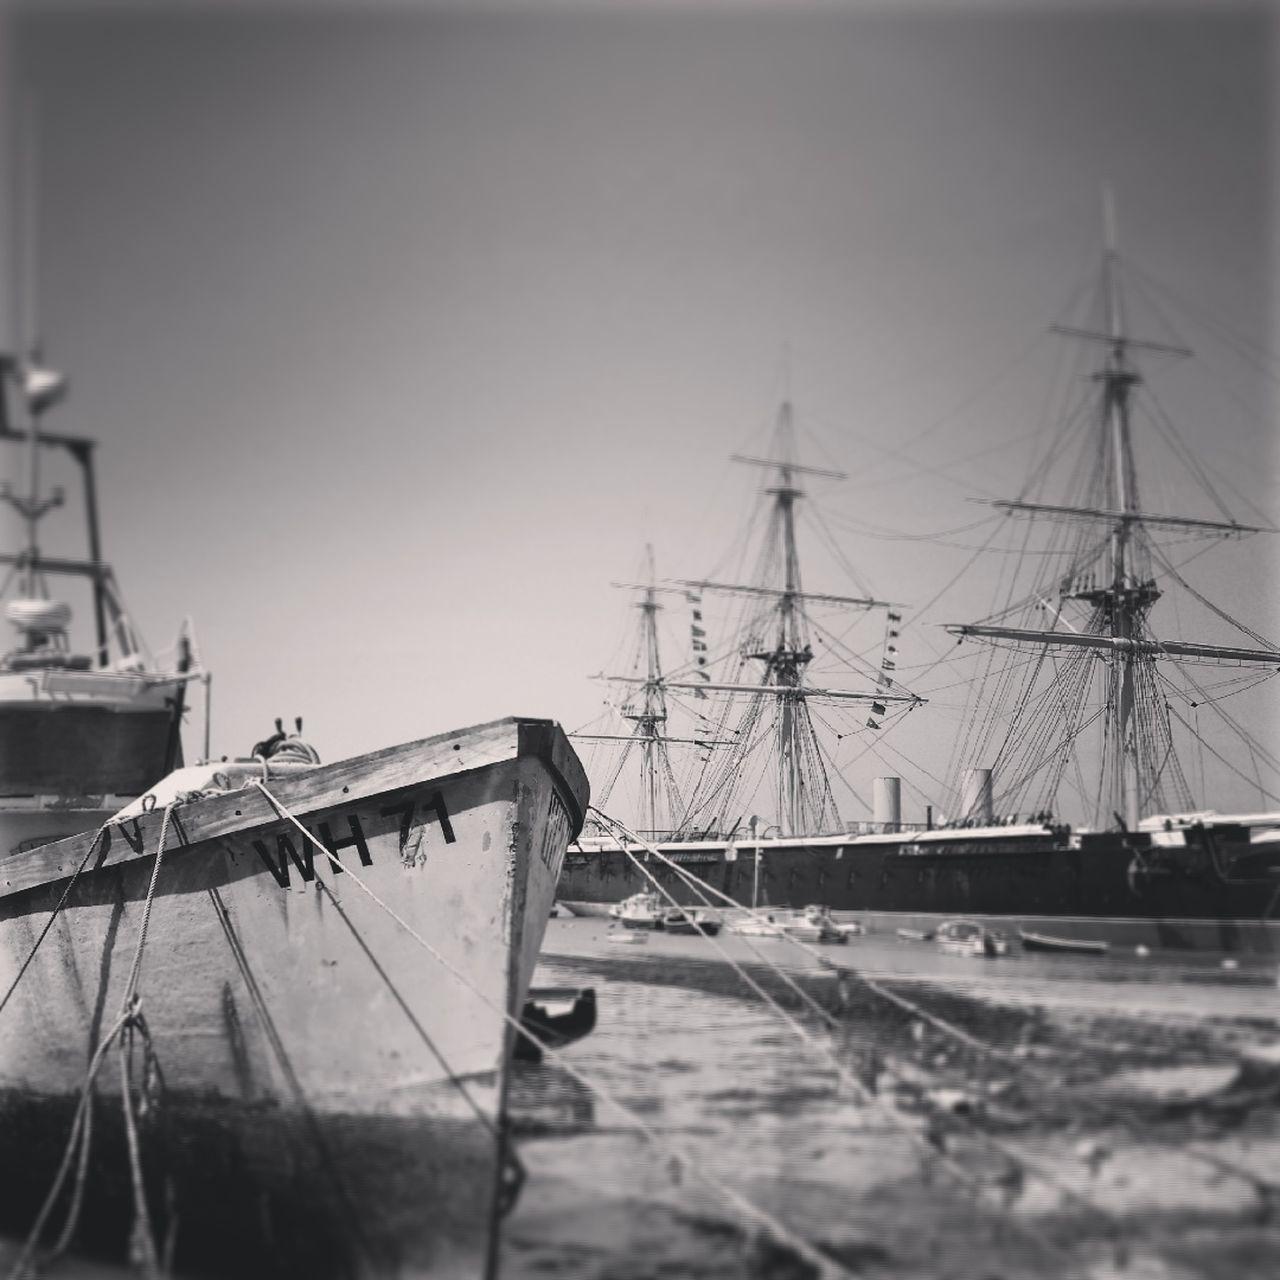 Close-Up Of Nautical Vessel